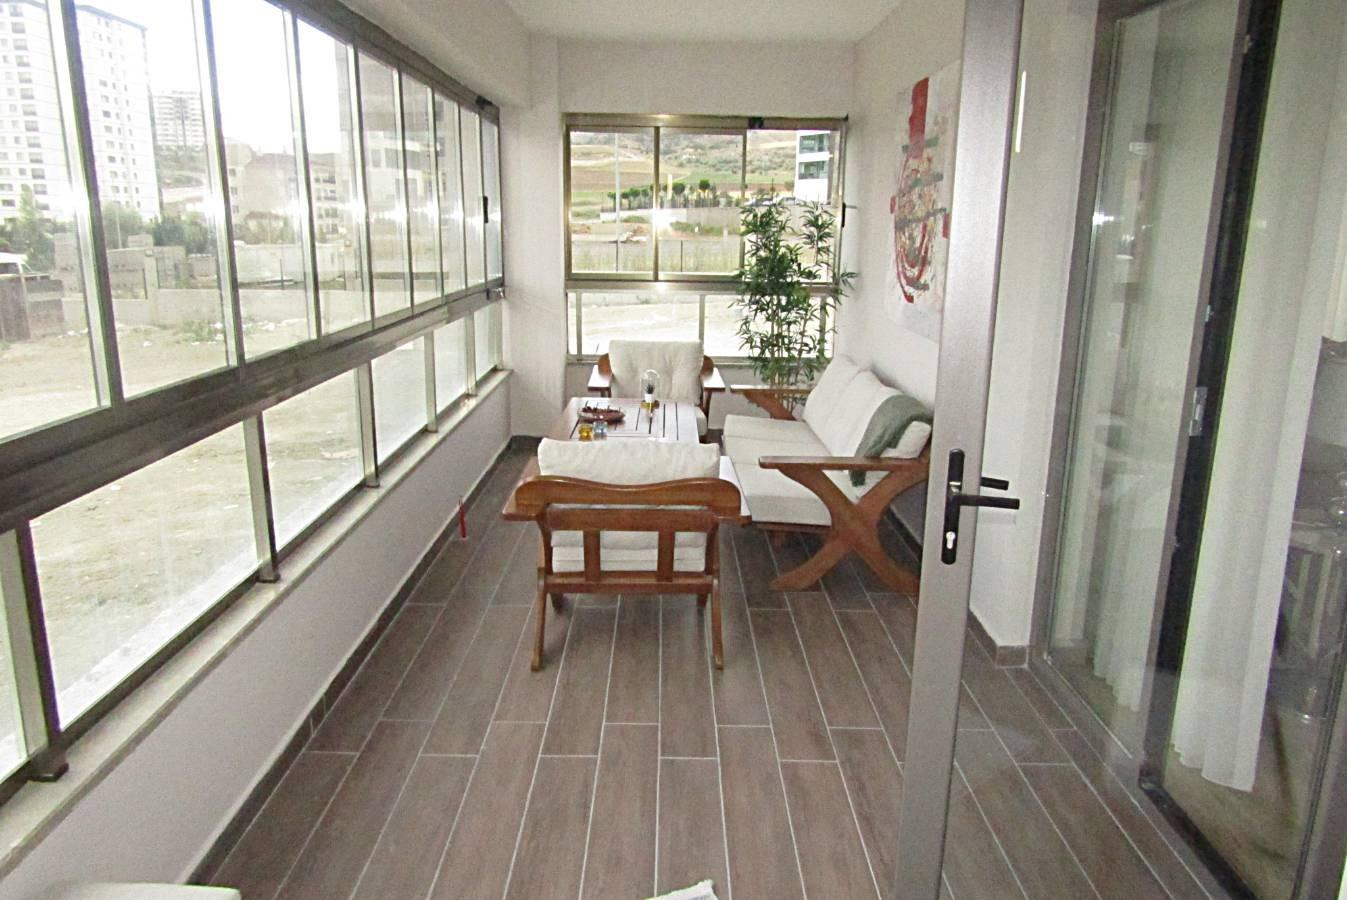 SR EMLAK'TAN BAĞLICA MAH'DE 4+1 145 m²  FULL YAPILI ARA KATTA GİYSİ ODALI SİTEDE ULTRA LÜX DAİRE